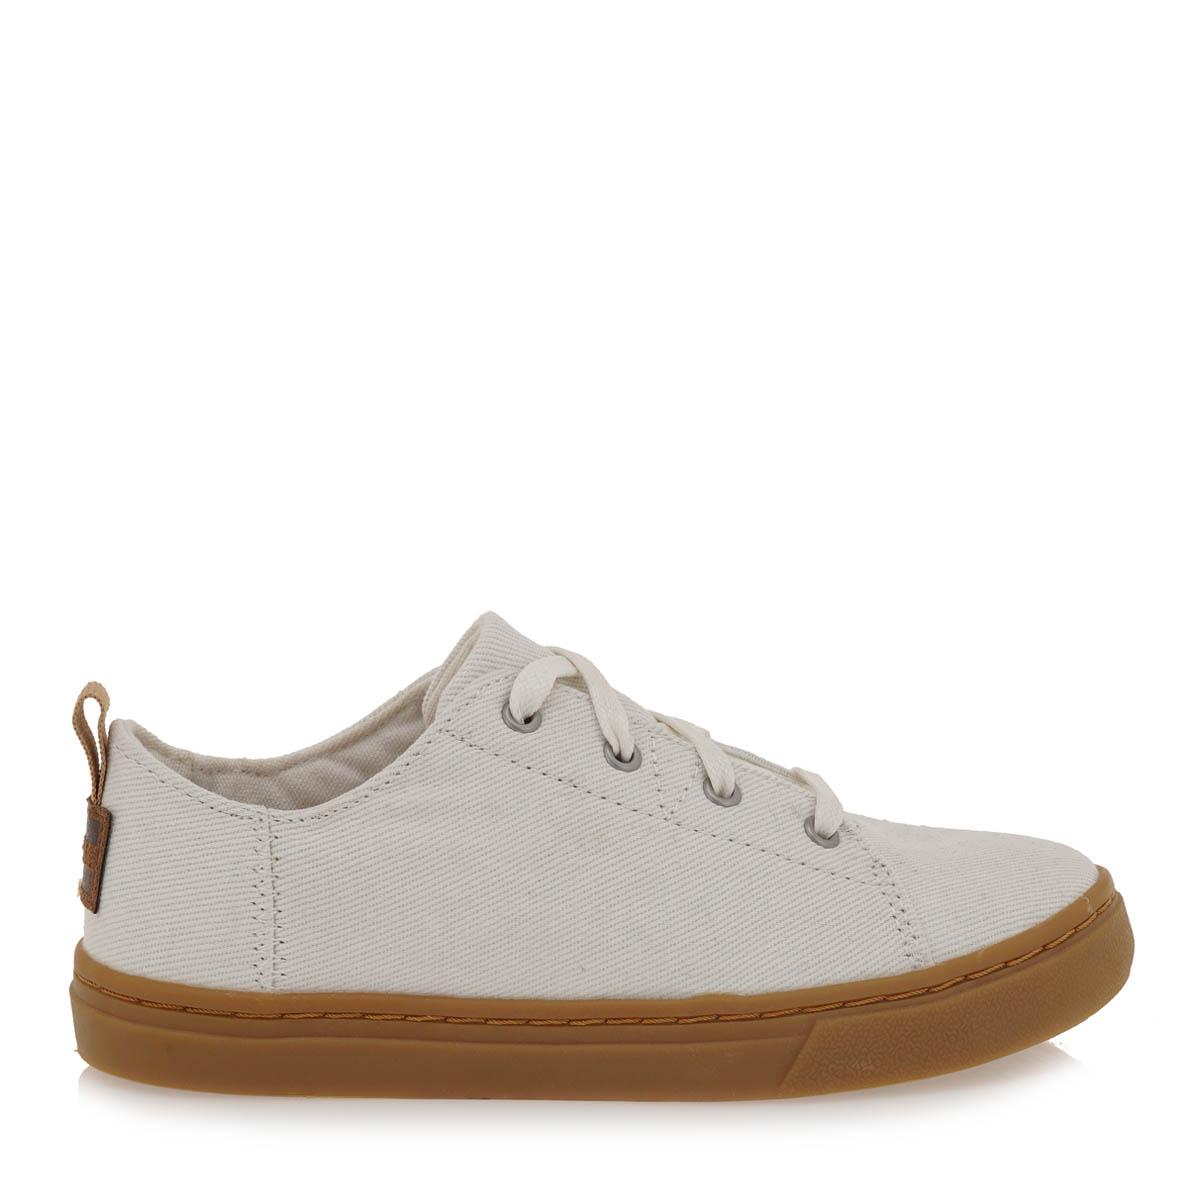 SNEAKERS σχέδιο: IA08L5101 outlet   παιδικα   sneakers